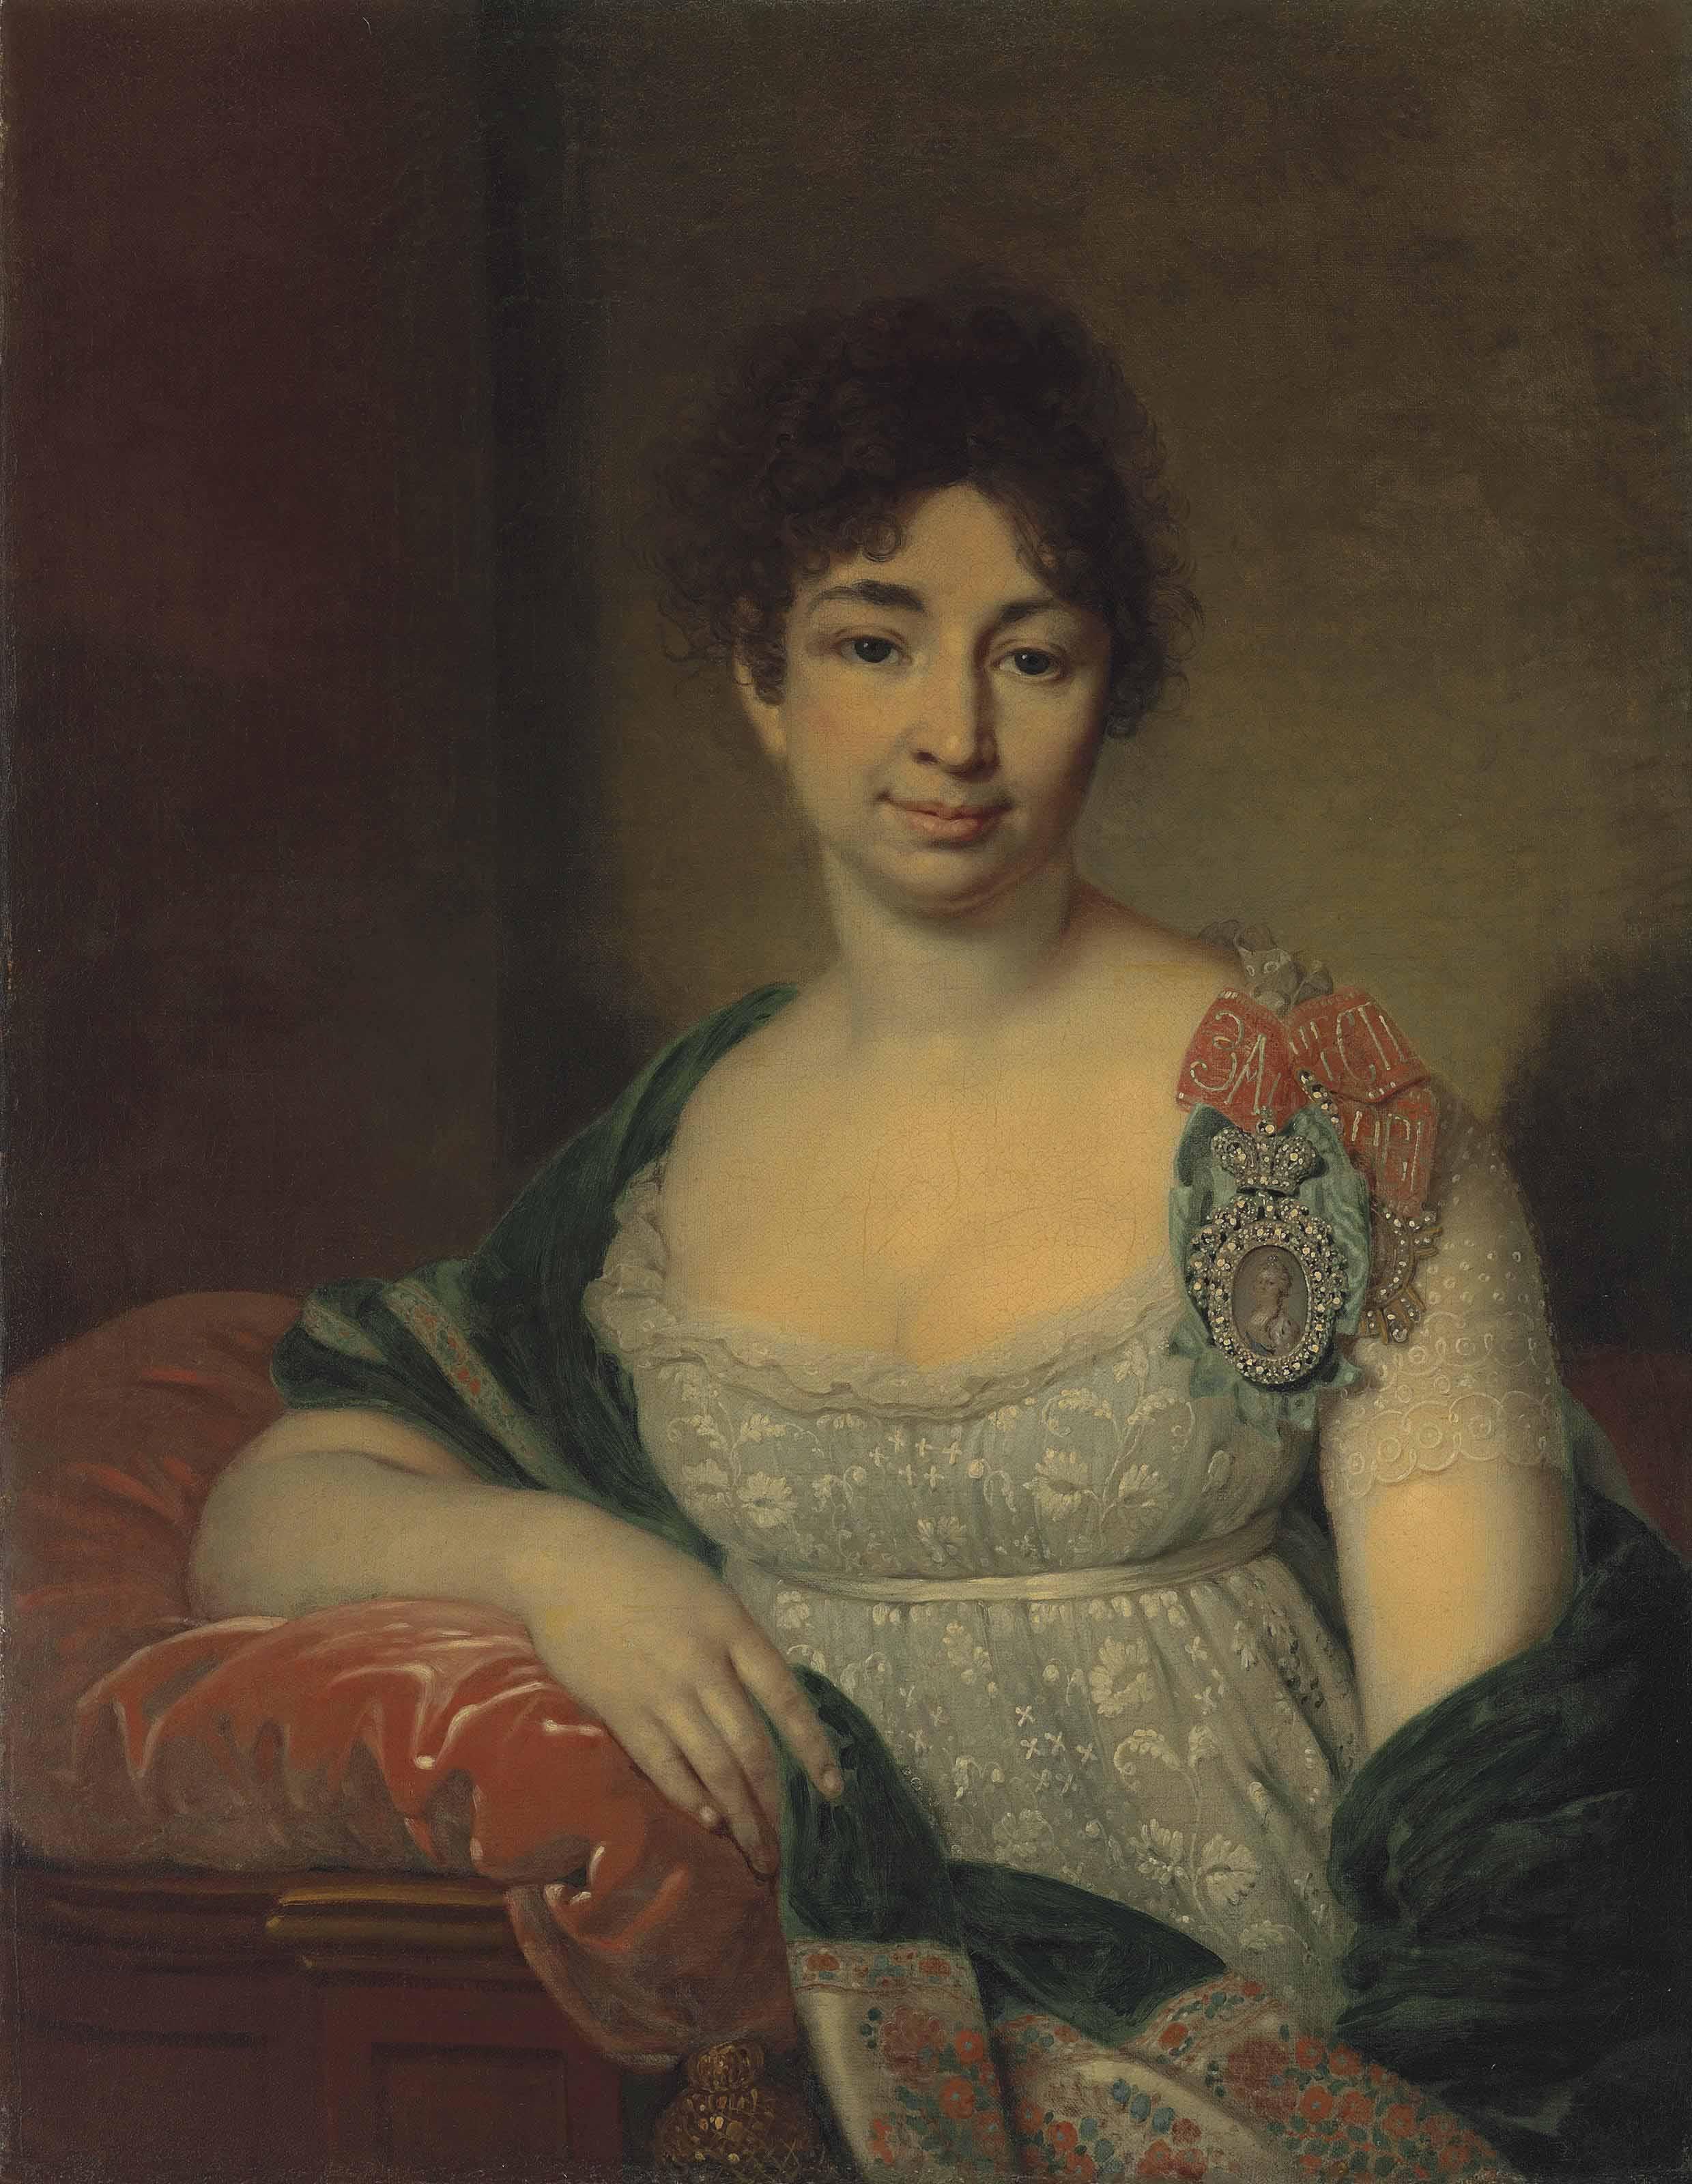 Portrait of Princess Ekaterina Nikolaevna Lopukhina, née Shetneva (1763-1839), wearing a Lady of Honour insignia and the Order of St Catherine